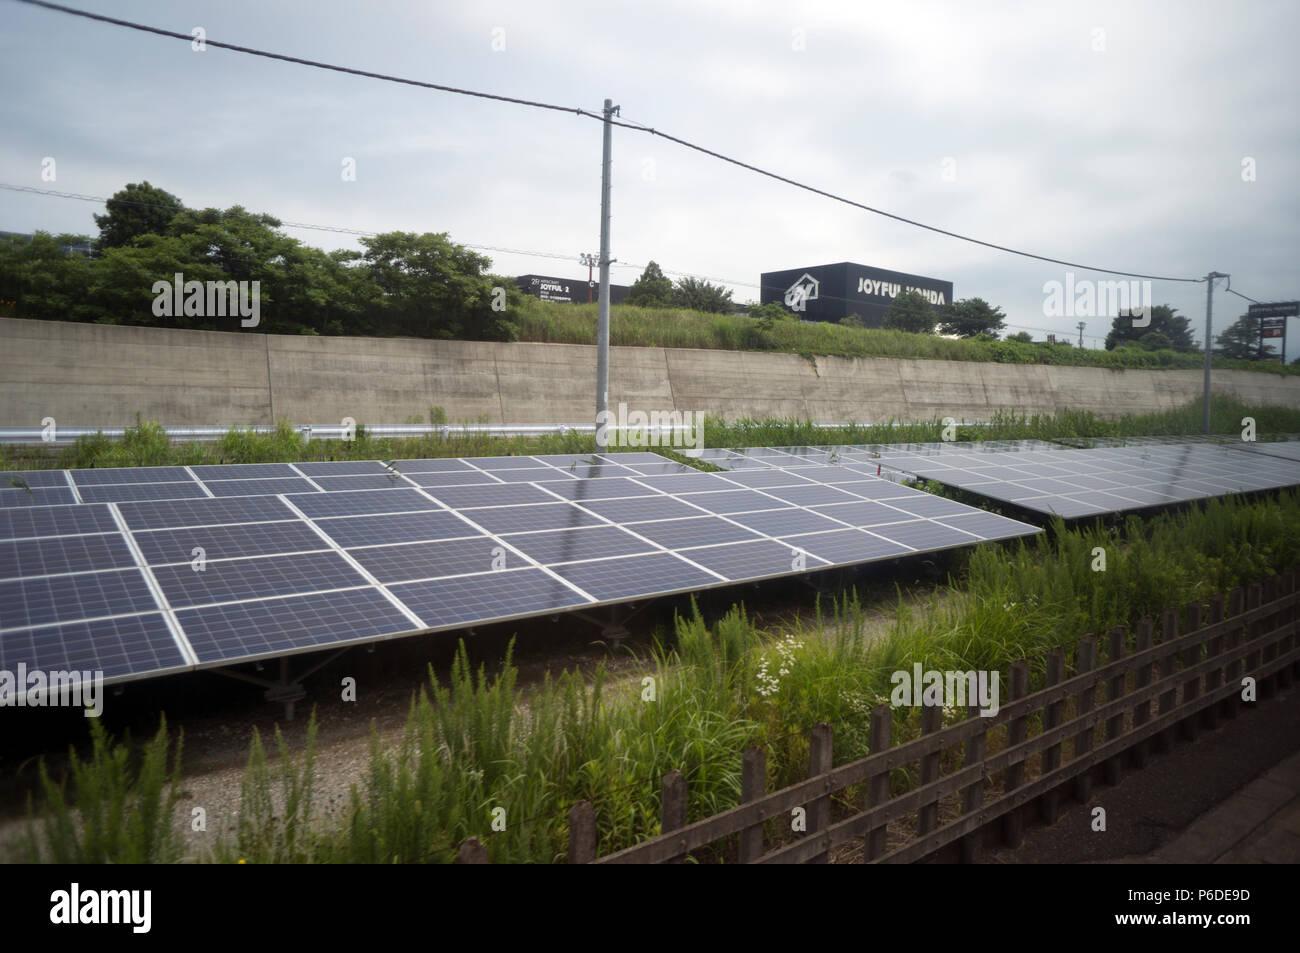 kilometres of Solar panels along the railway to Narita airport, Tokyo Japan - Stock Image